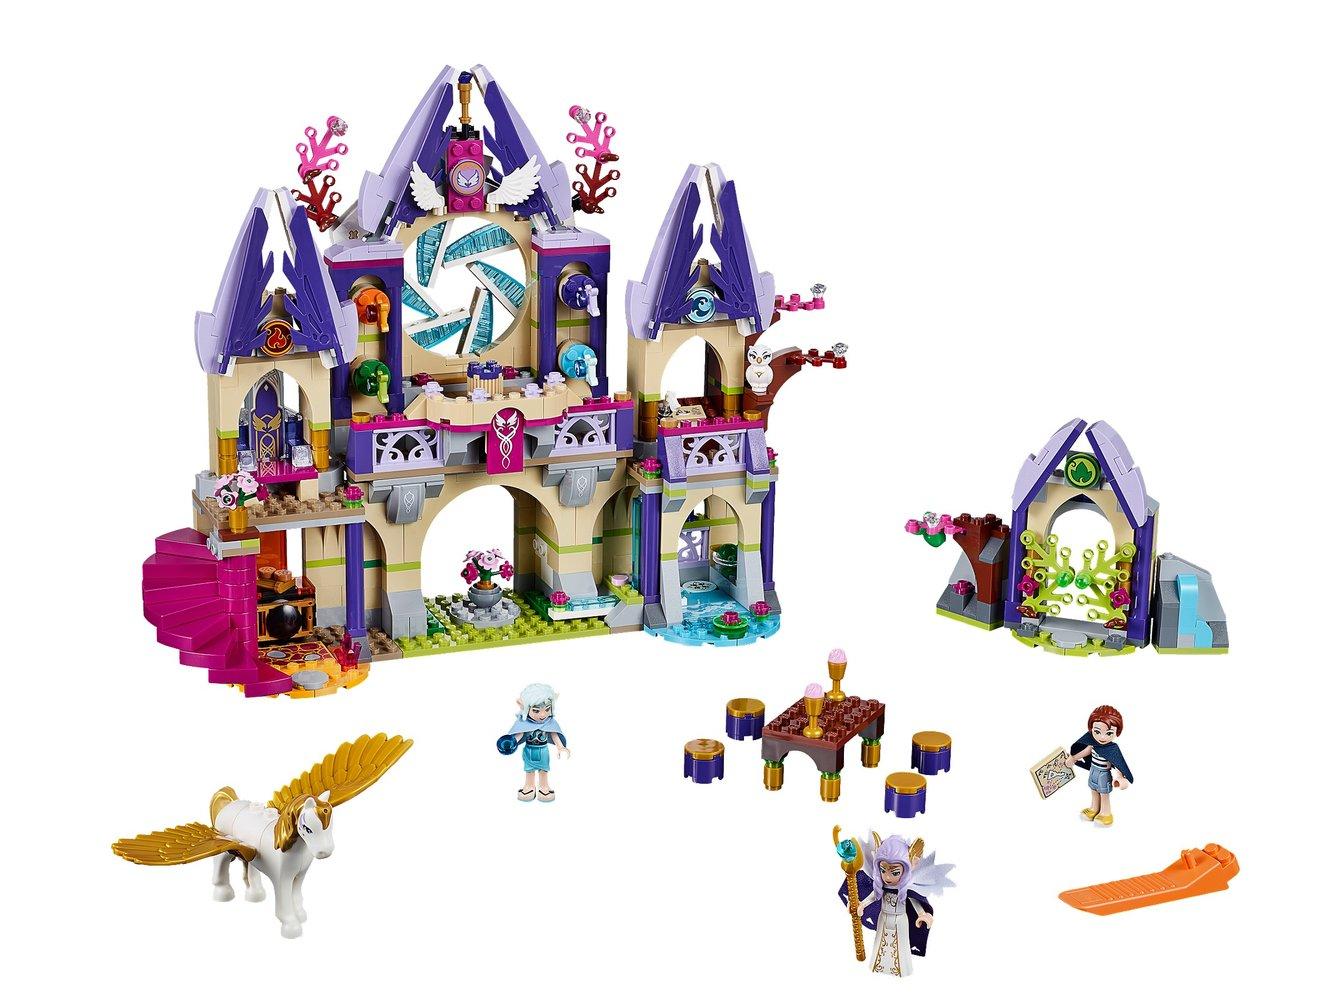 Skyra's Mysterious Sky Castle